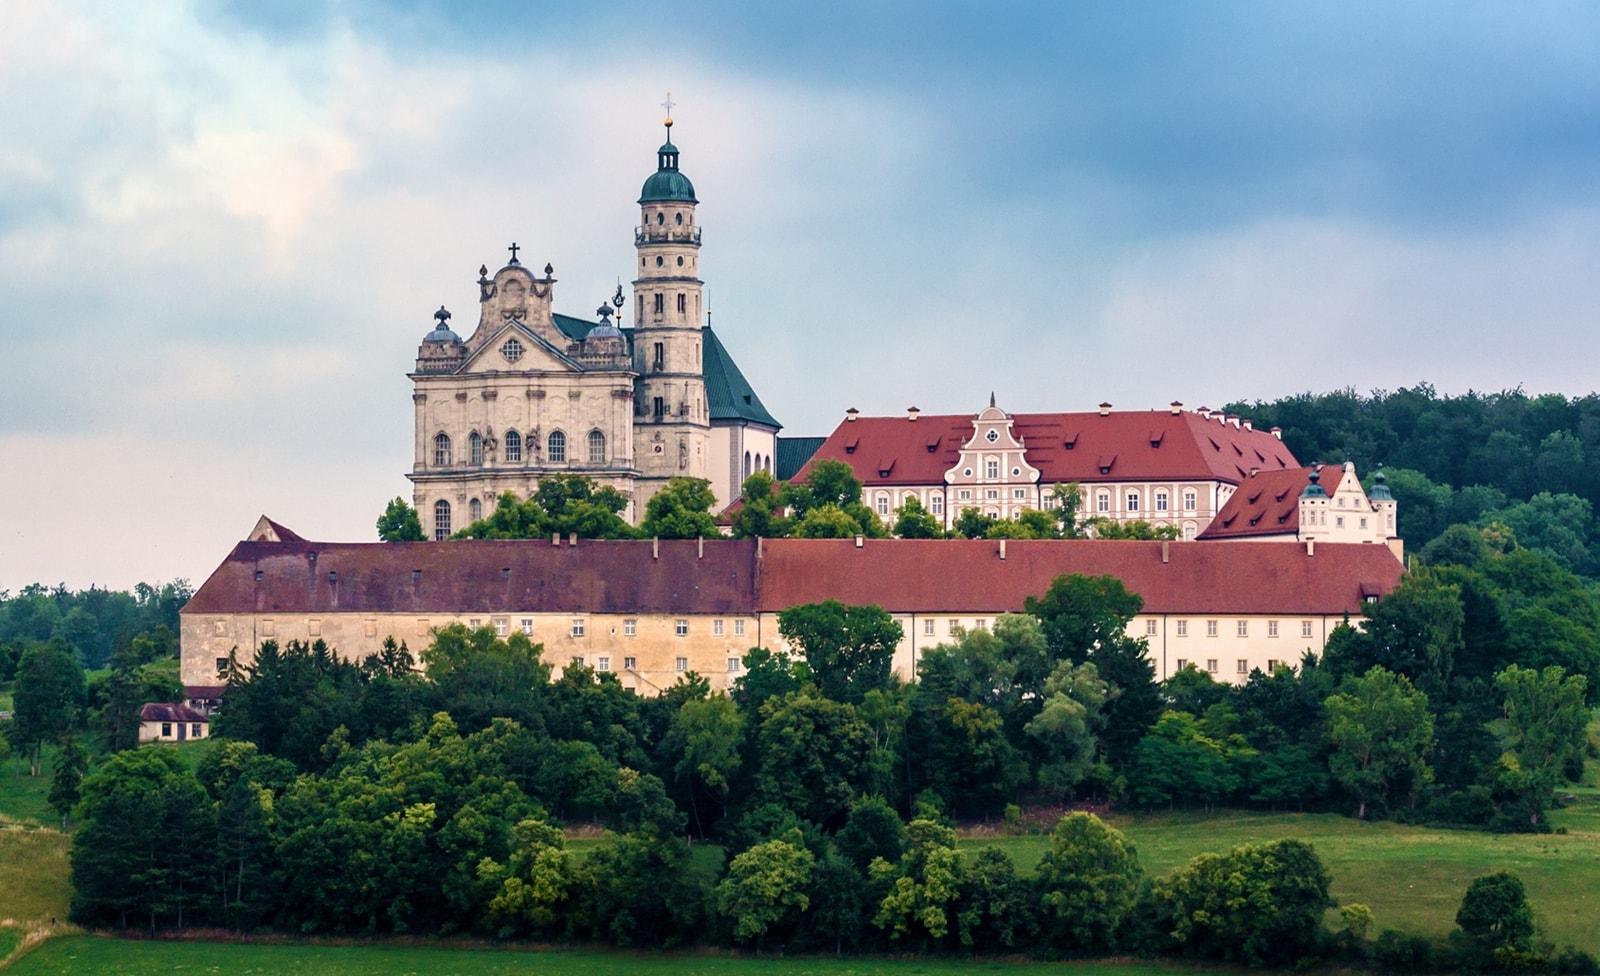 Kloster in Baden-Württemberg